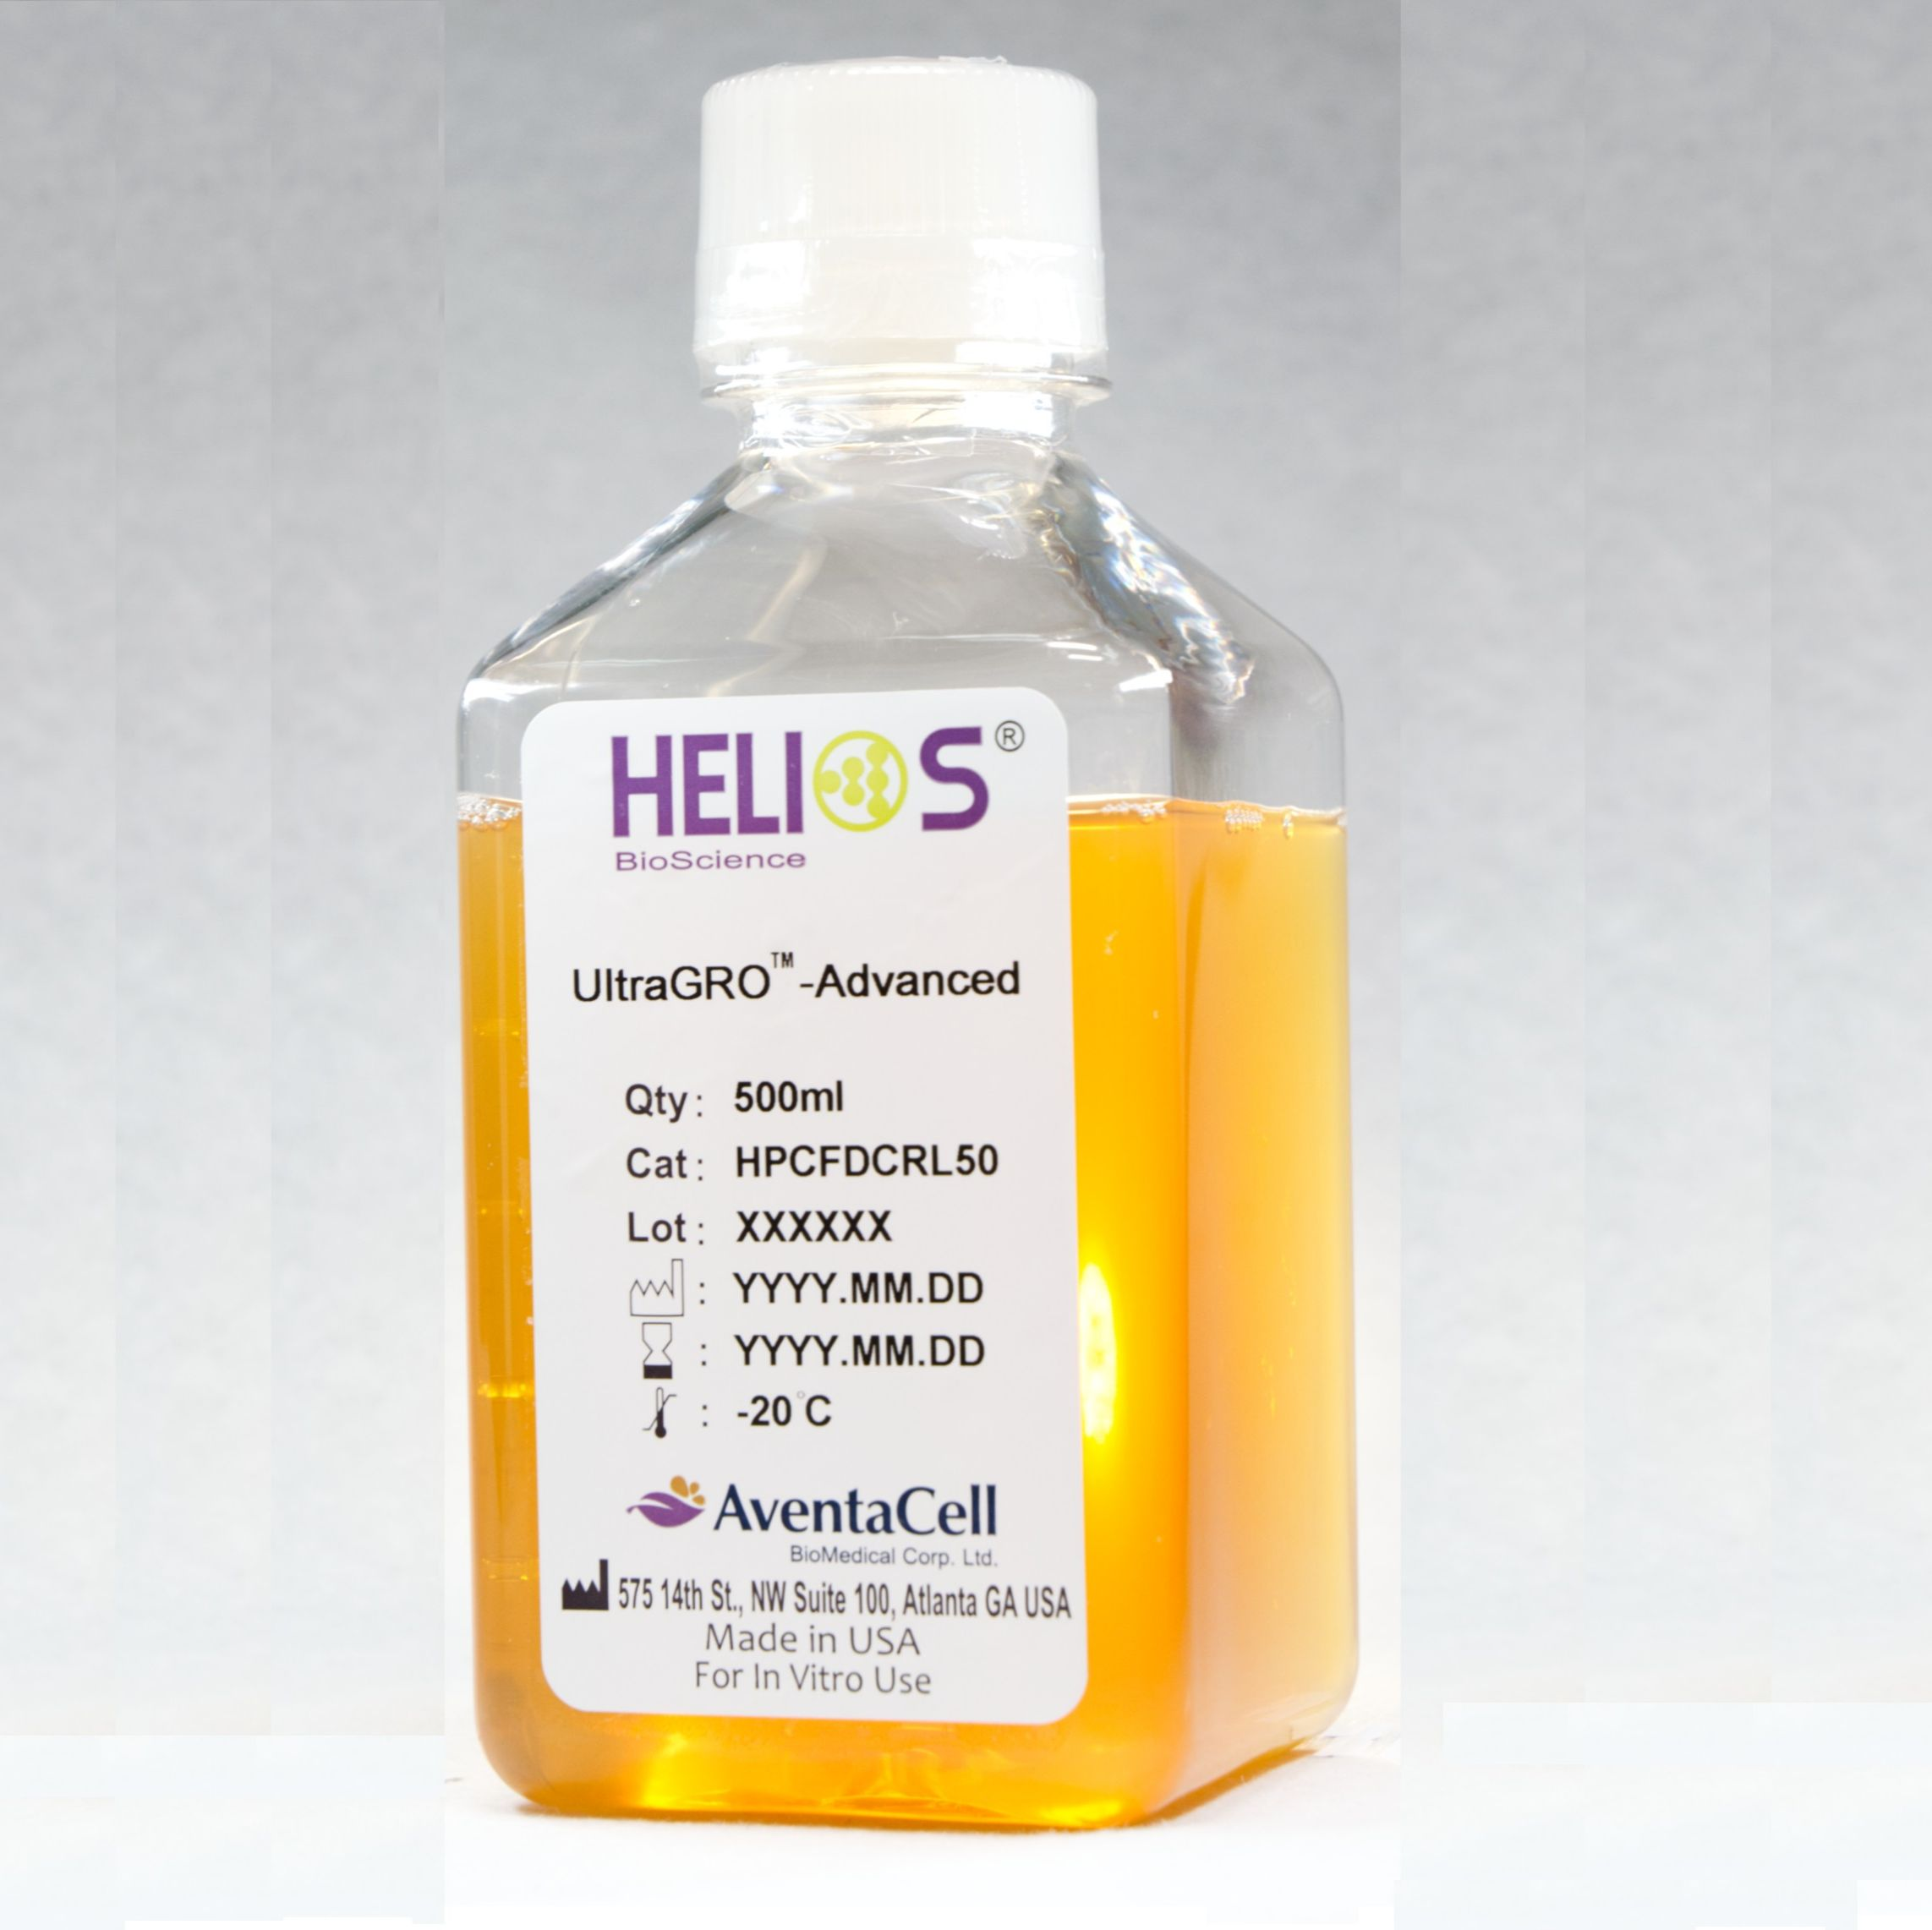 Helios UltraGRO™-Advanced(科研级别)